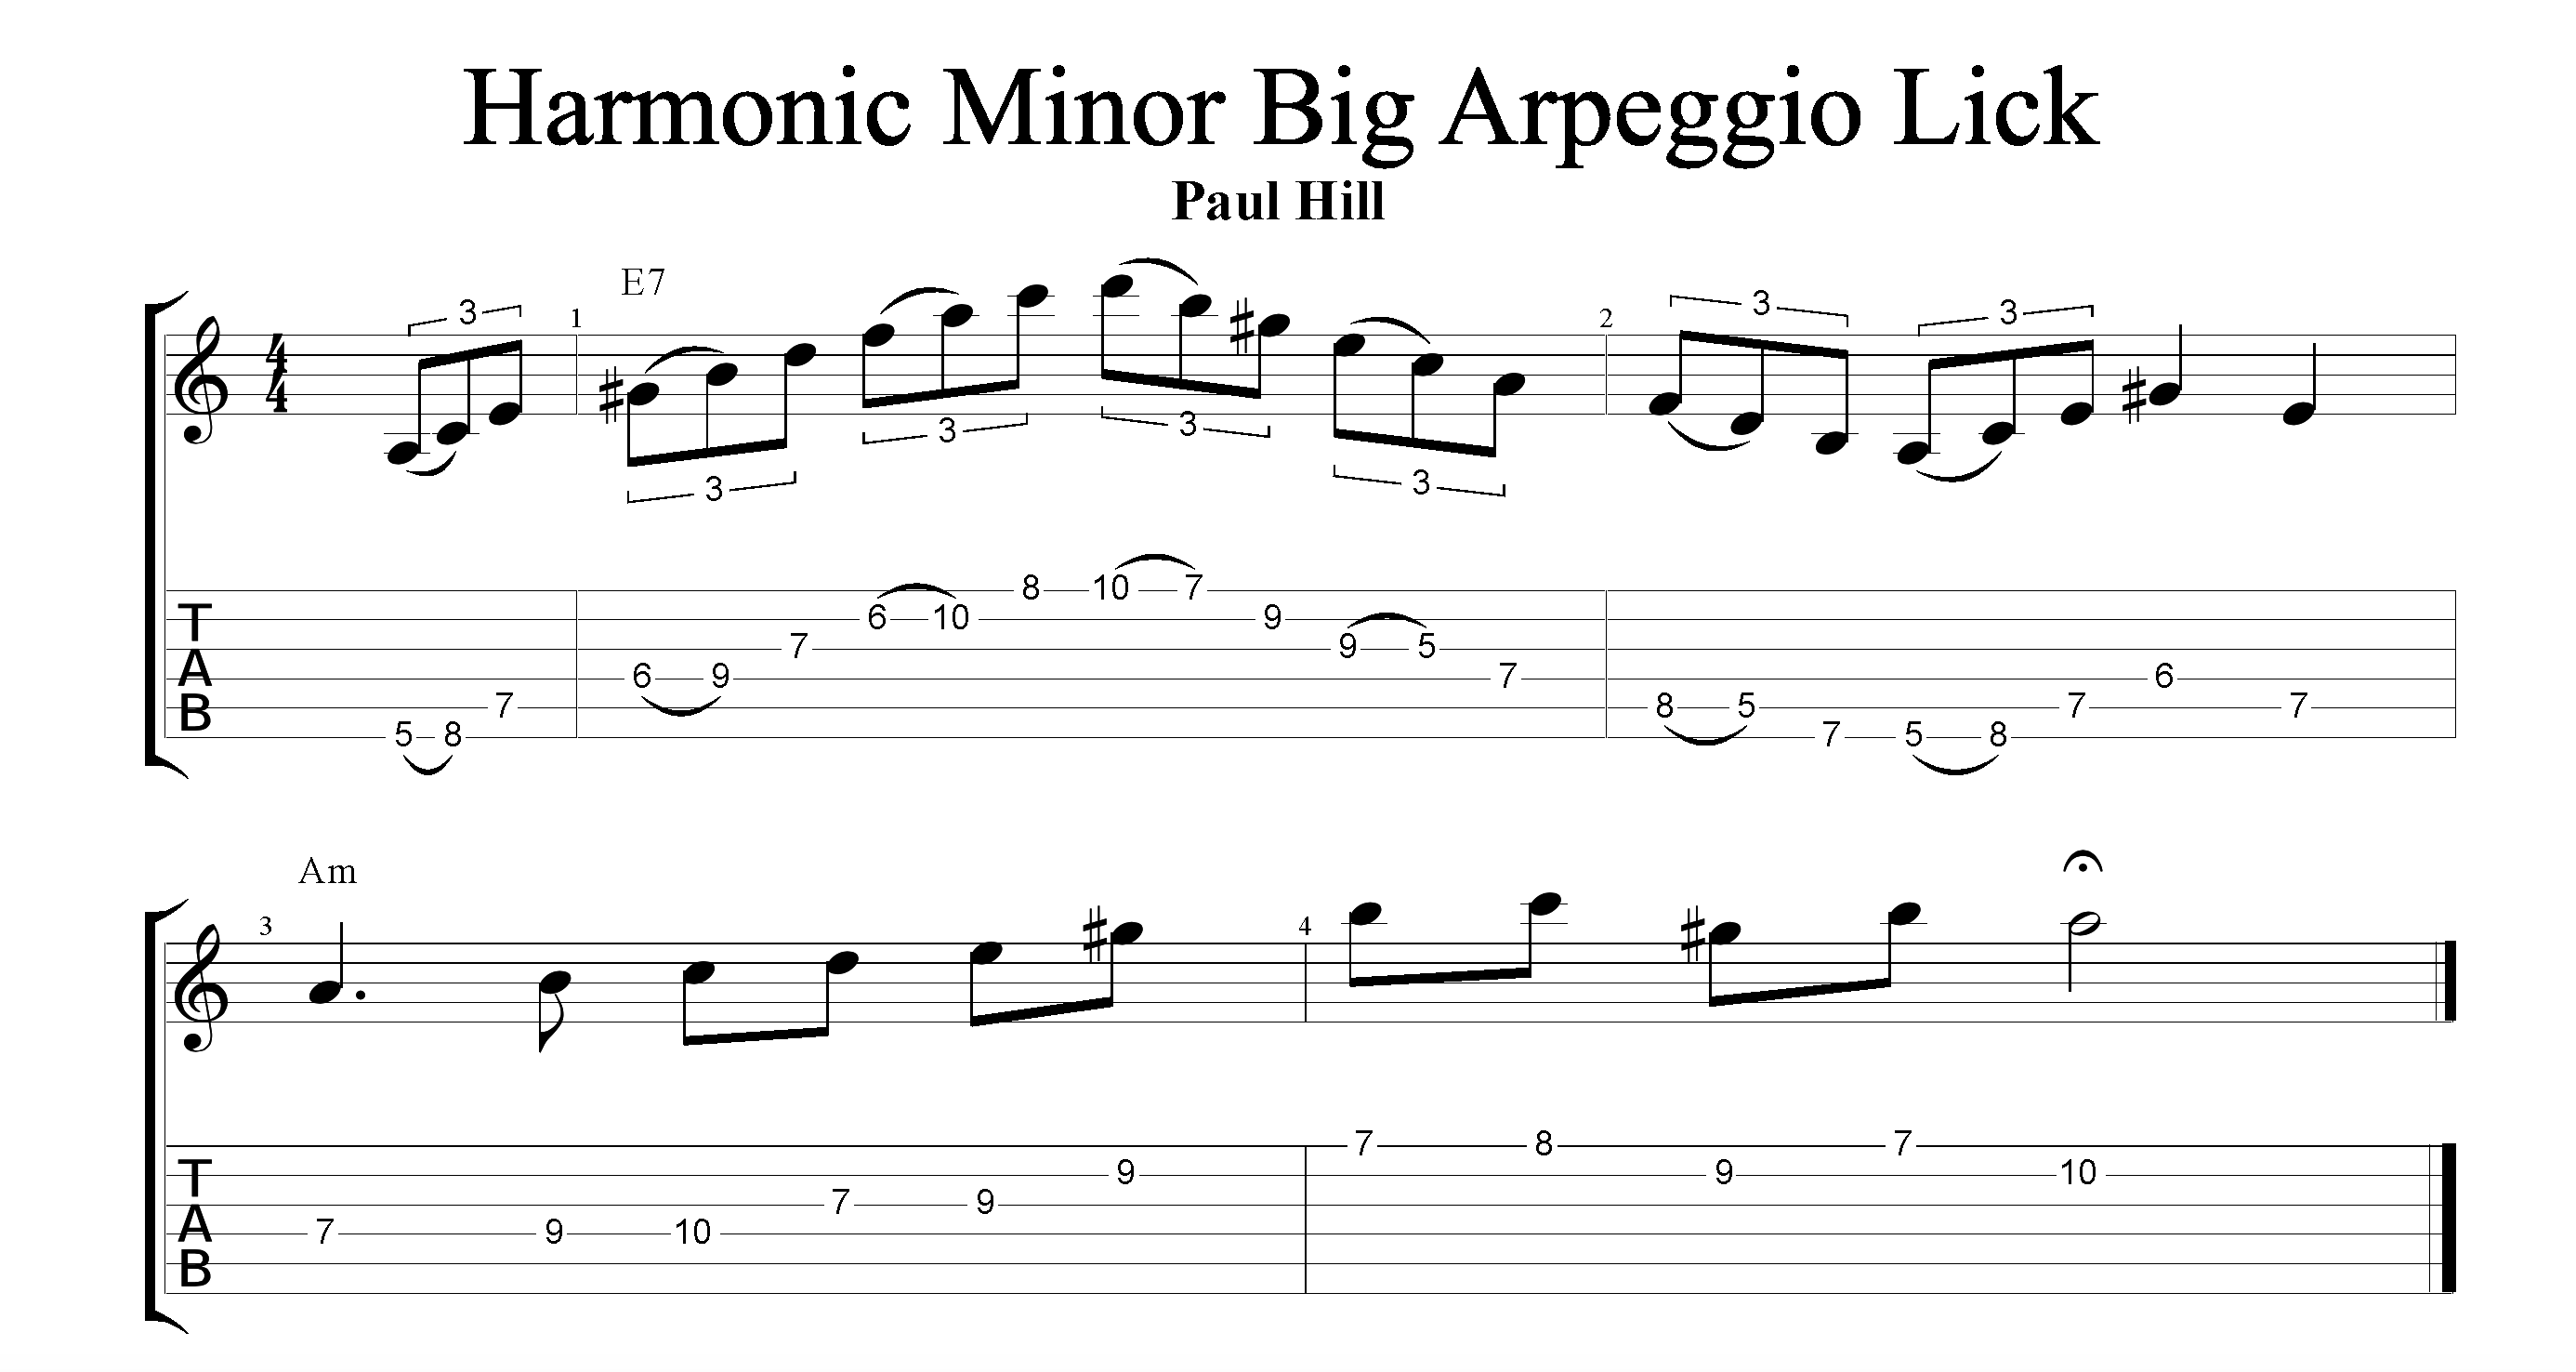 Harmonic Minor Big Arpeggio Lick